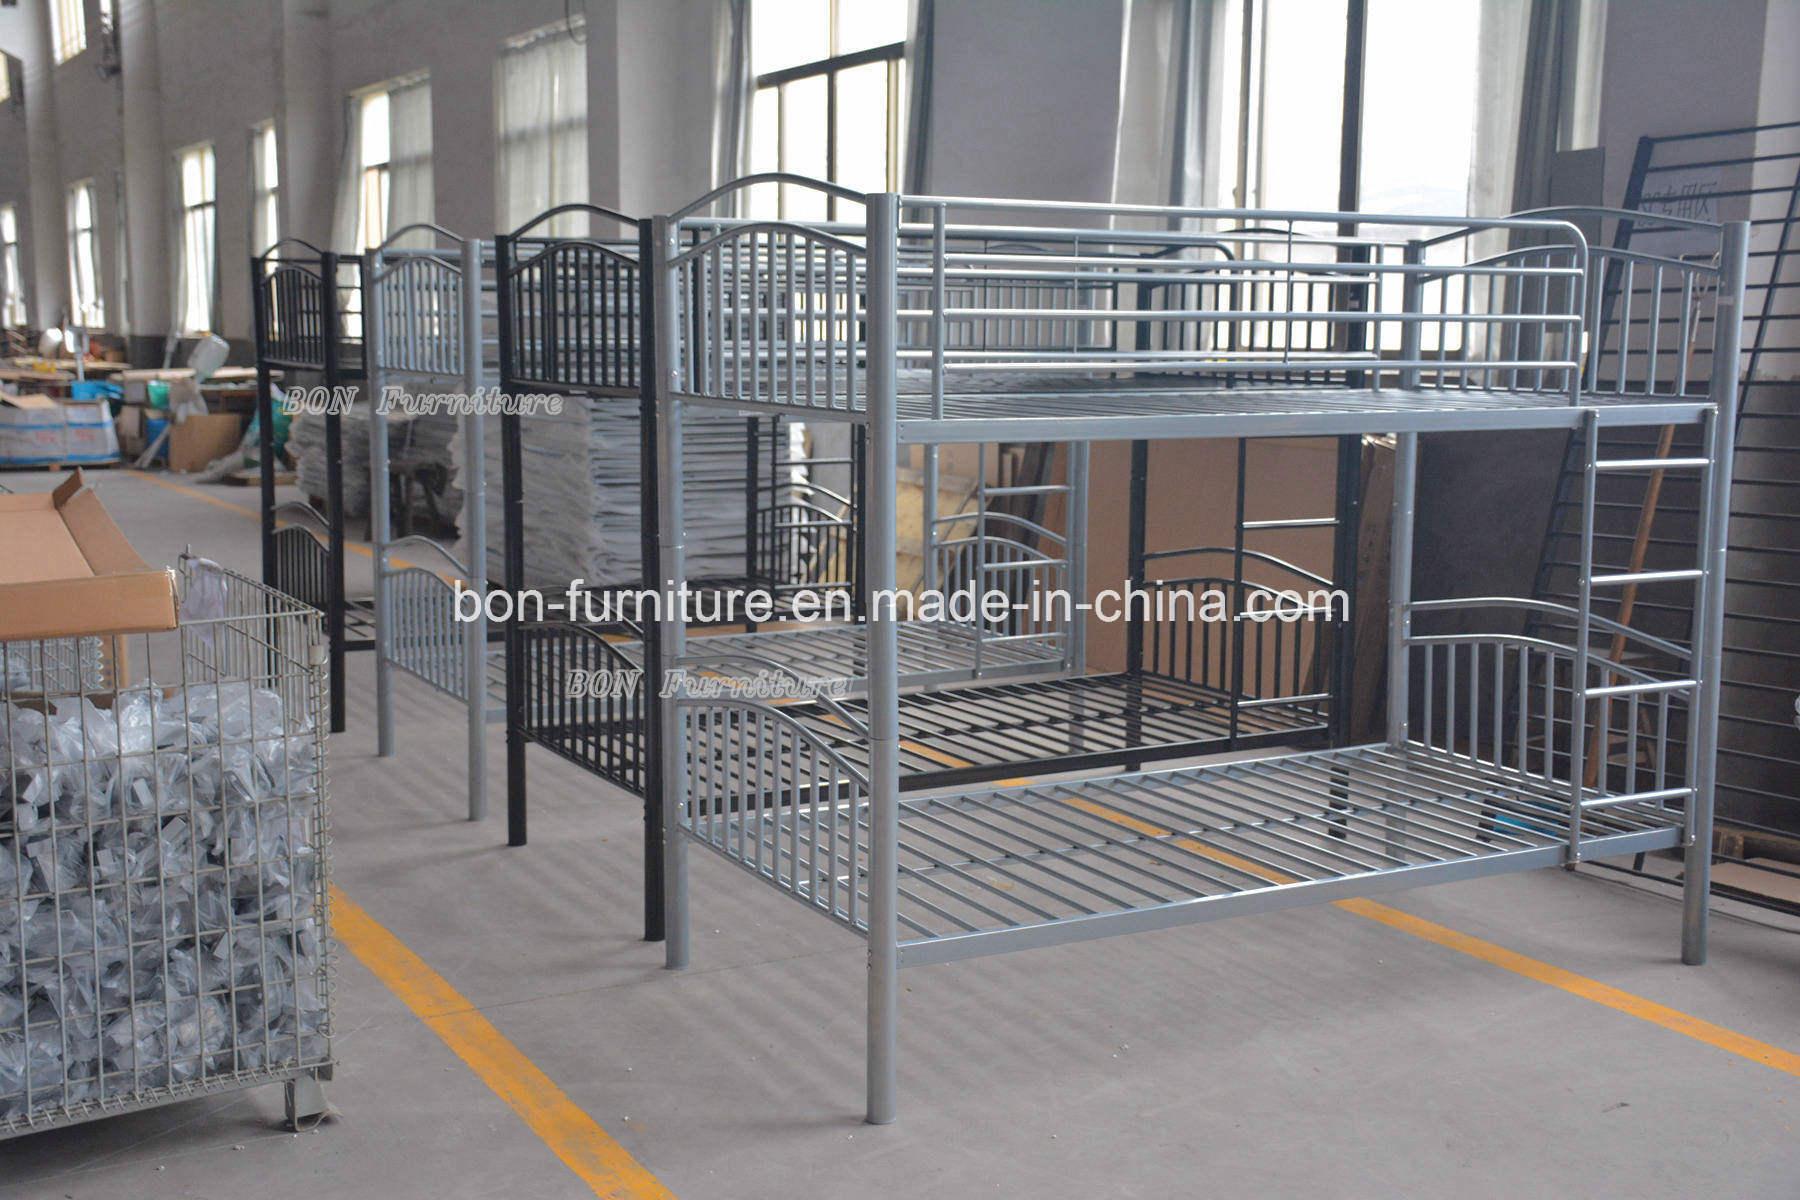 Metal Bunk Bed/ UK Twin Sleeper Bed